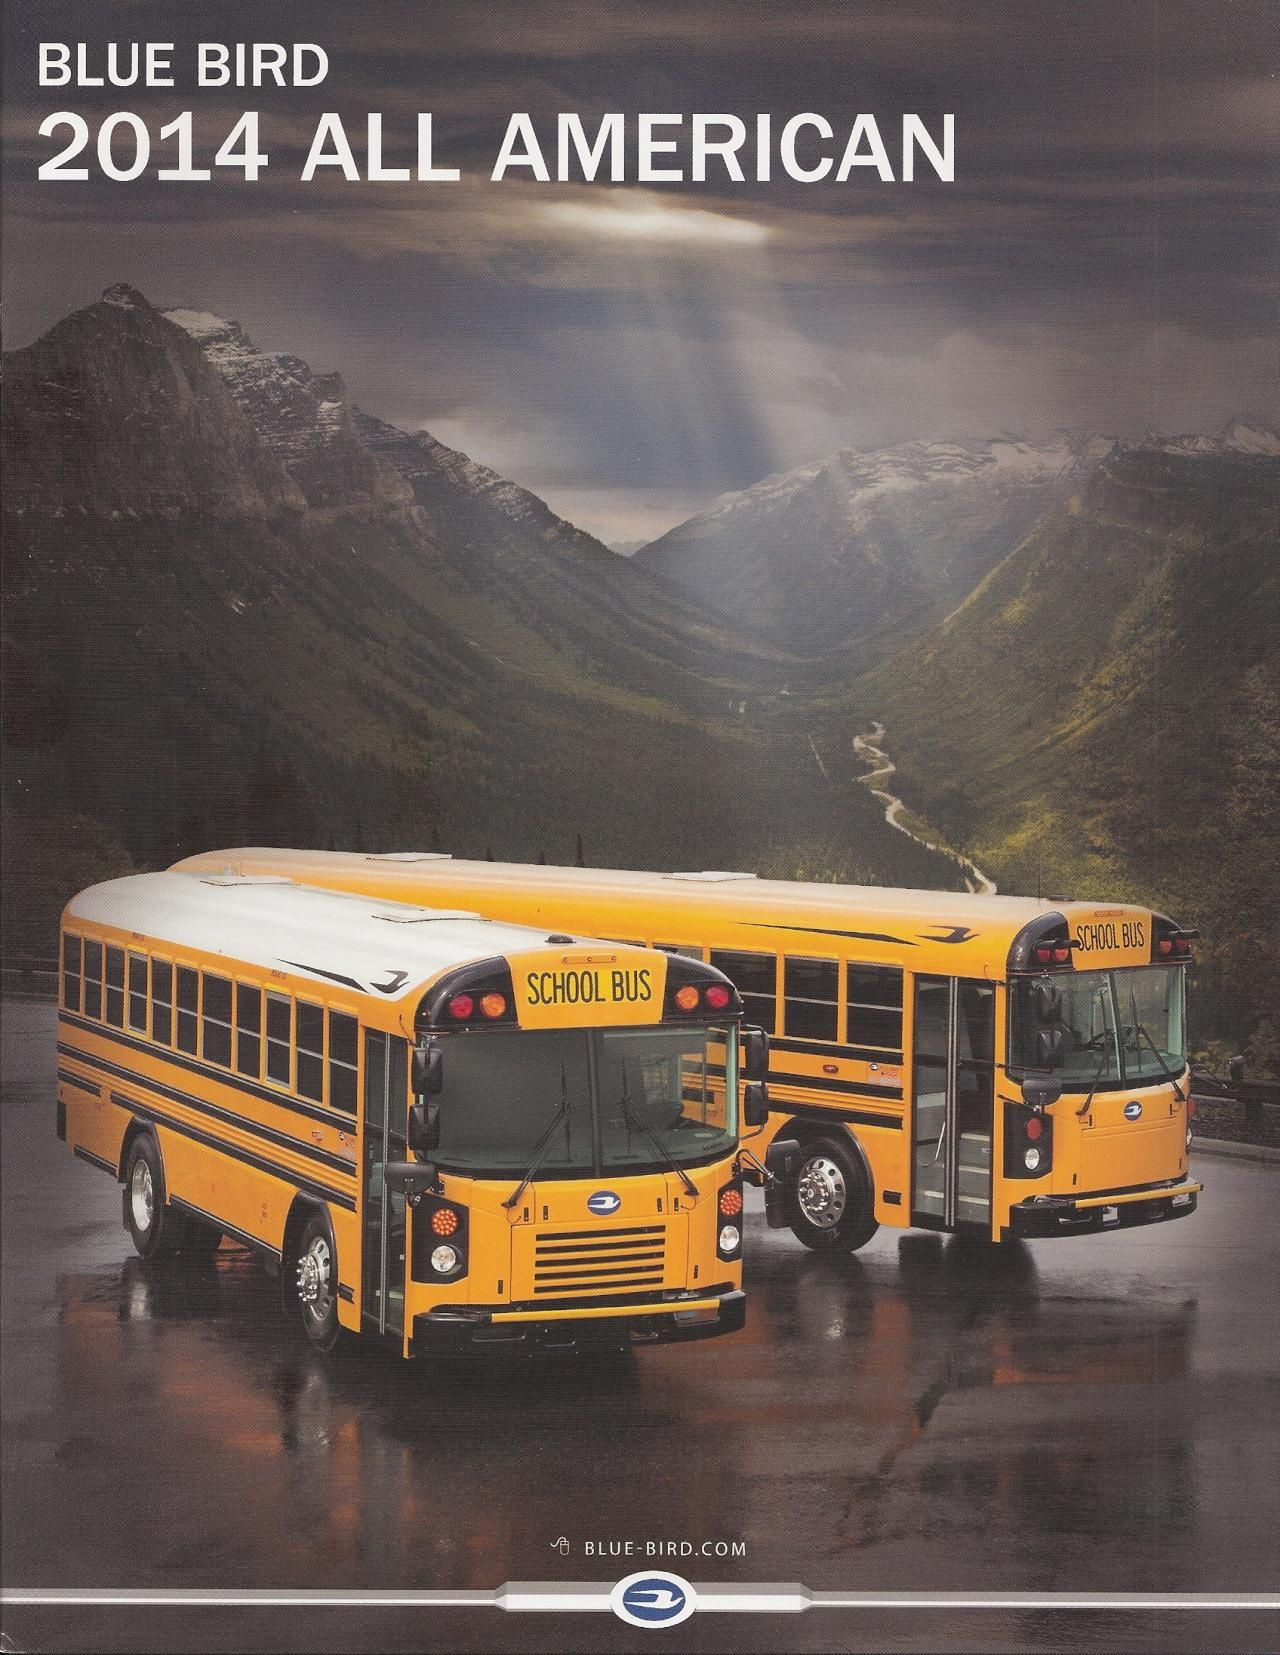 School Bus Driver, School Buses, Blue Bus, Bus Conversion, Jdm, Brochures